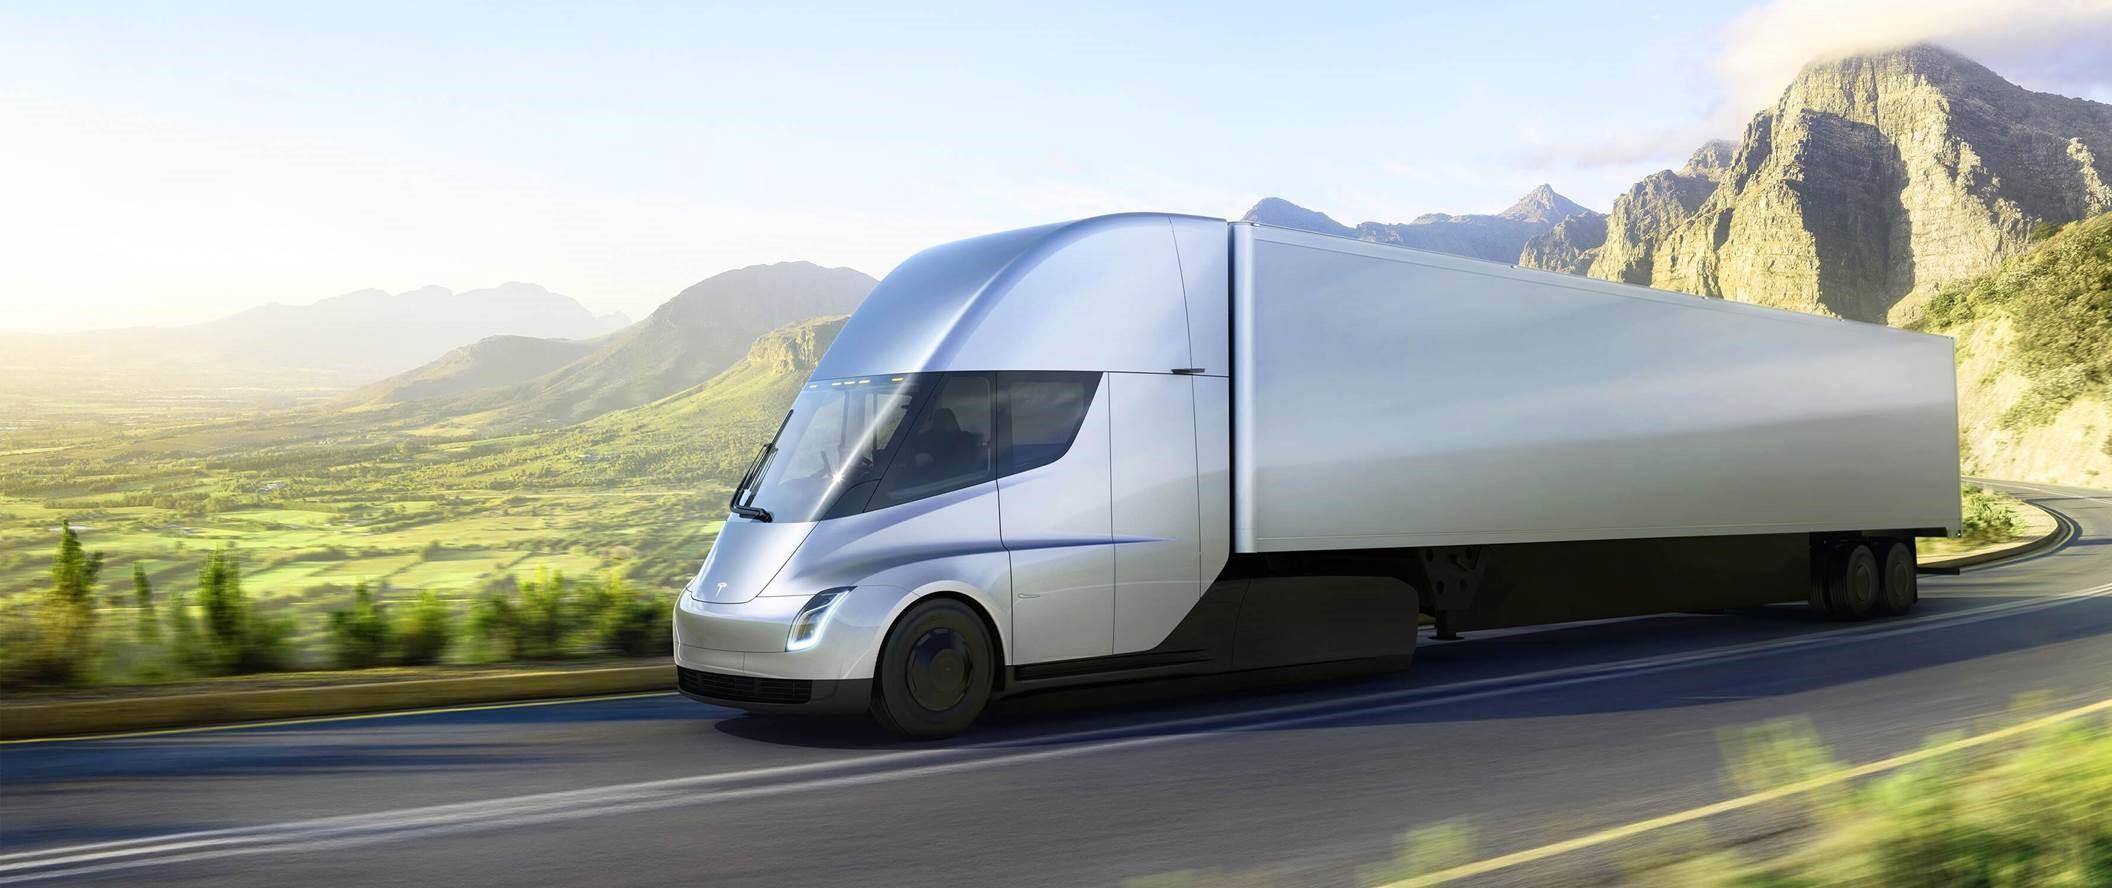 The Future of Freight: Autonomous Trucks